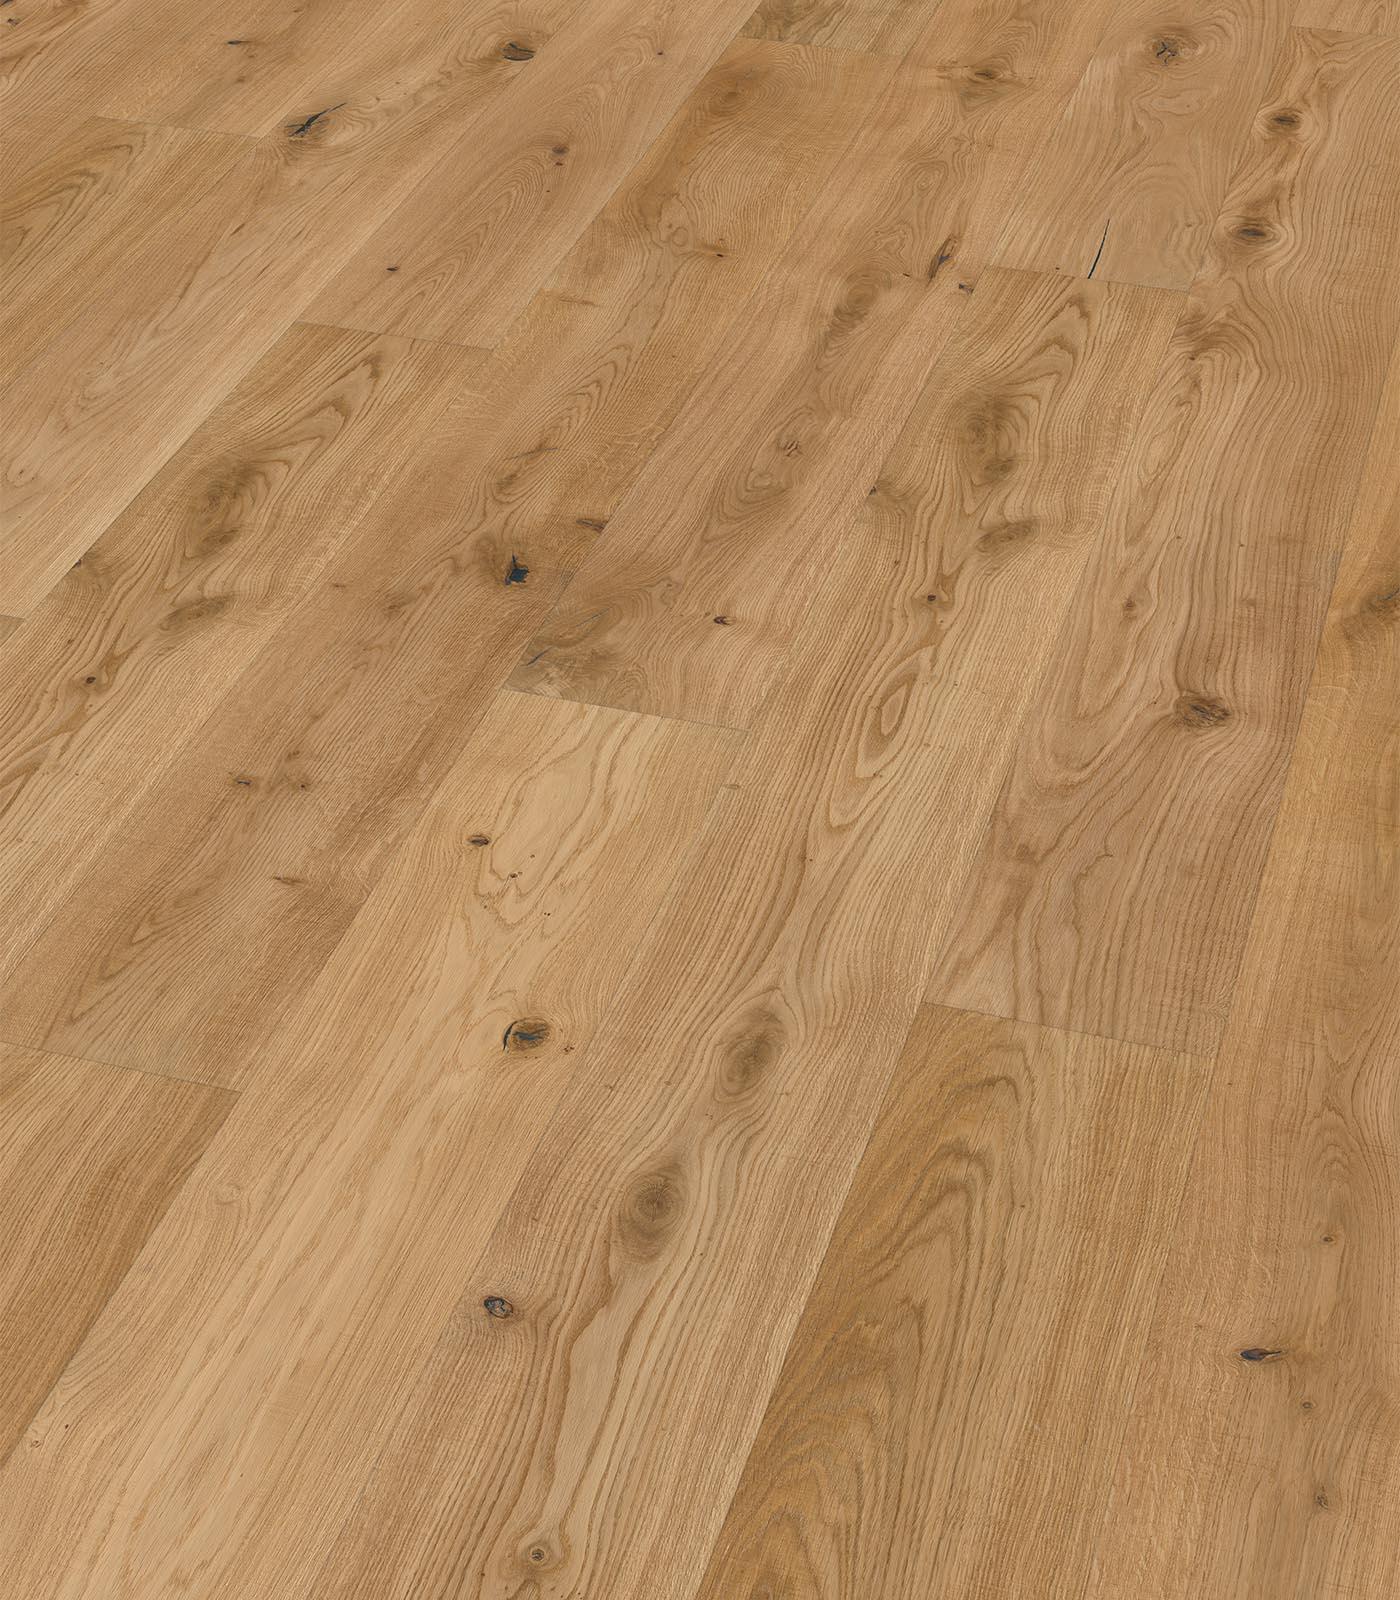 Taurus-Antique Collection-European Oak floors-angle